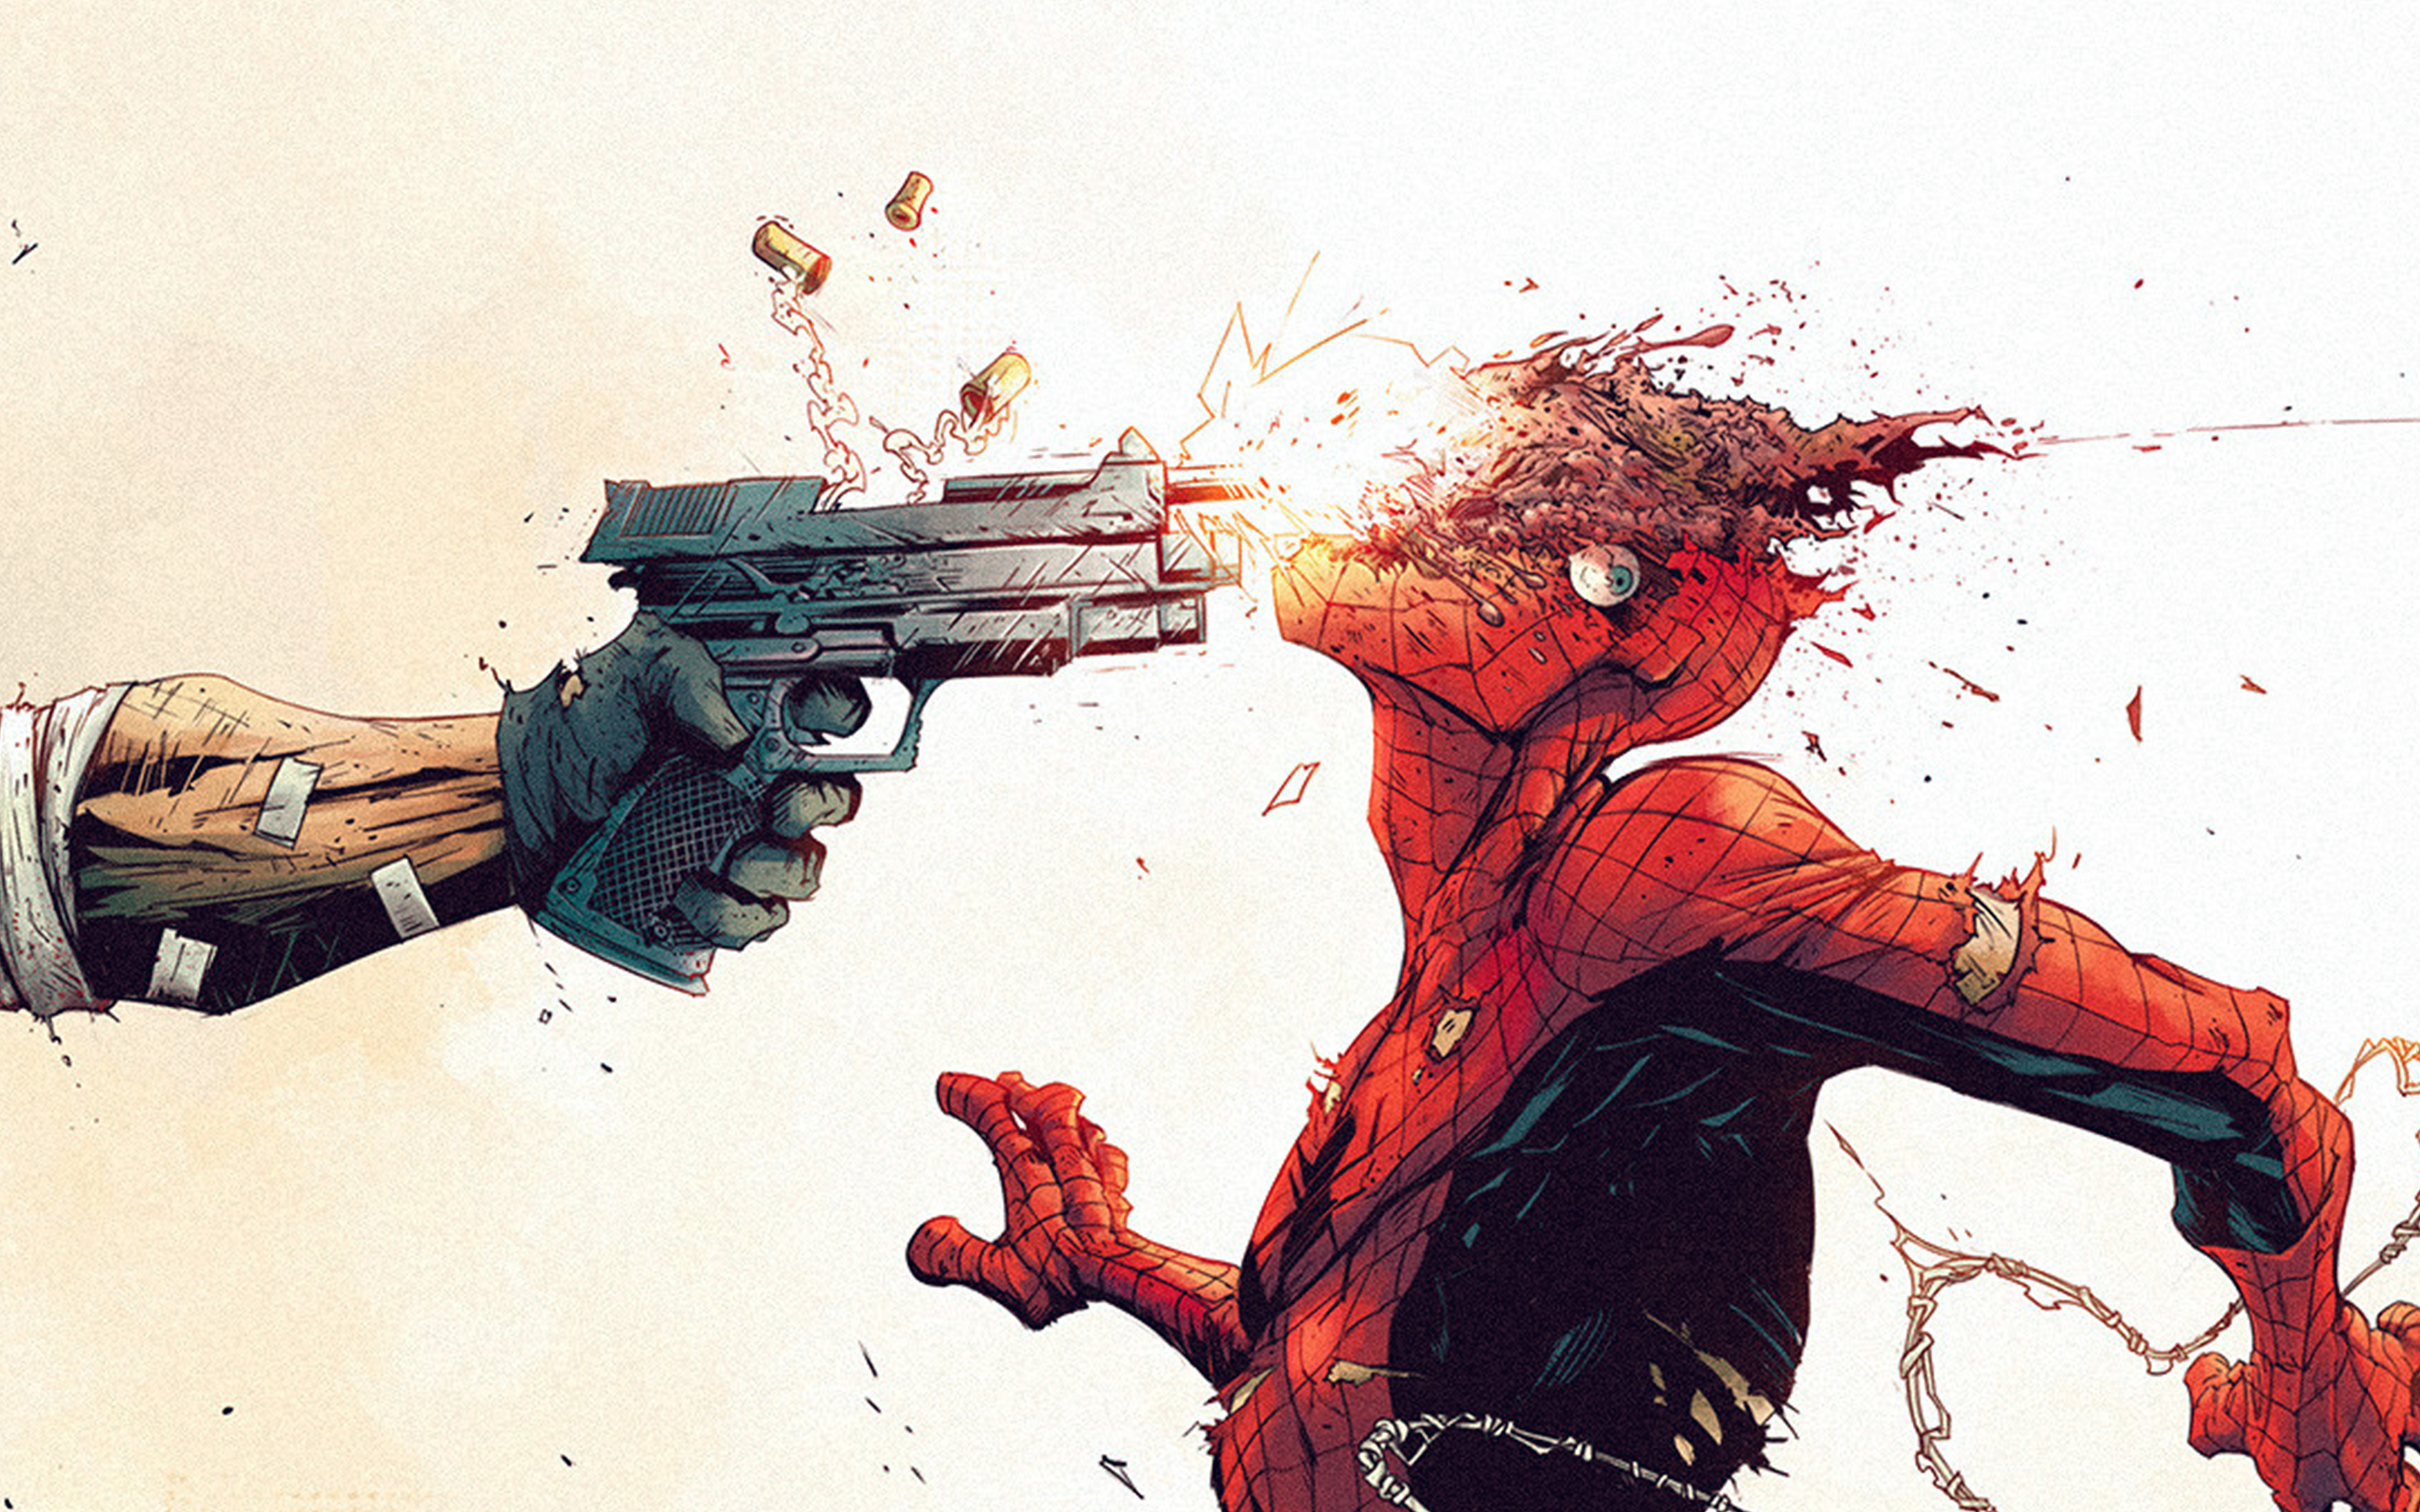 Pc Cartoon Fall Wallpapers Aw51 Punisher Spiderman Tonton Revolver Illustration Art